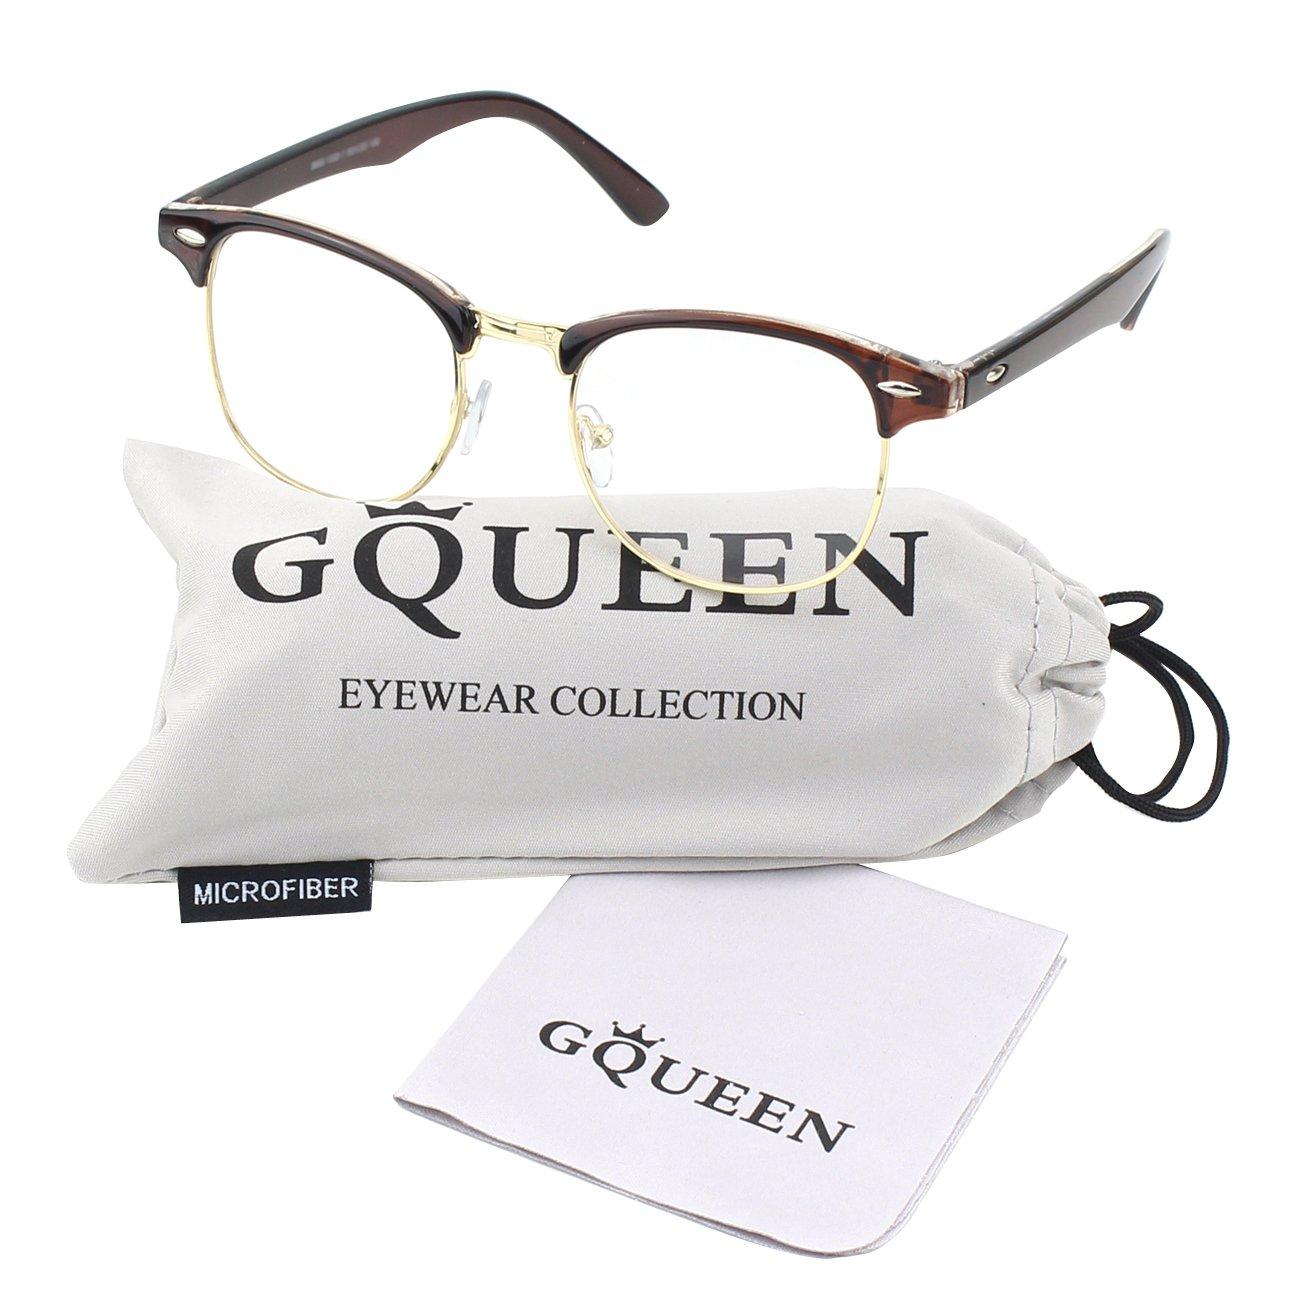 GQUEEN 201556 Vintage Inspired Classic Half Frame Nerd UV400 Clear Lens Glasses, Brown FBAGQ56c-02